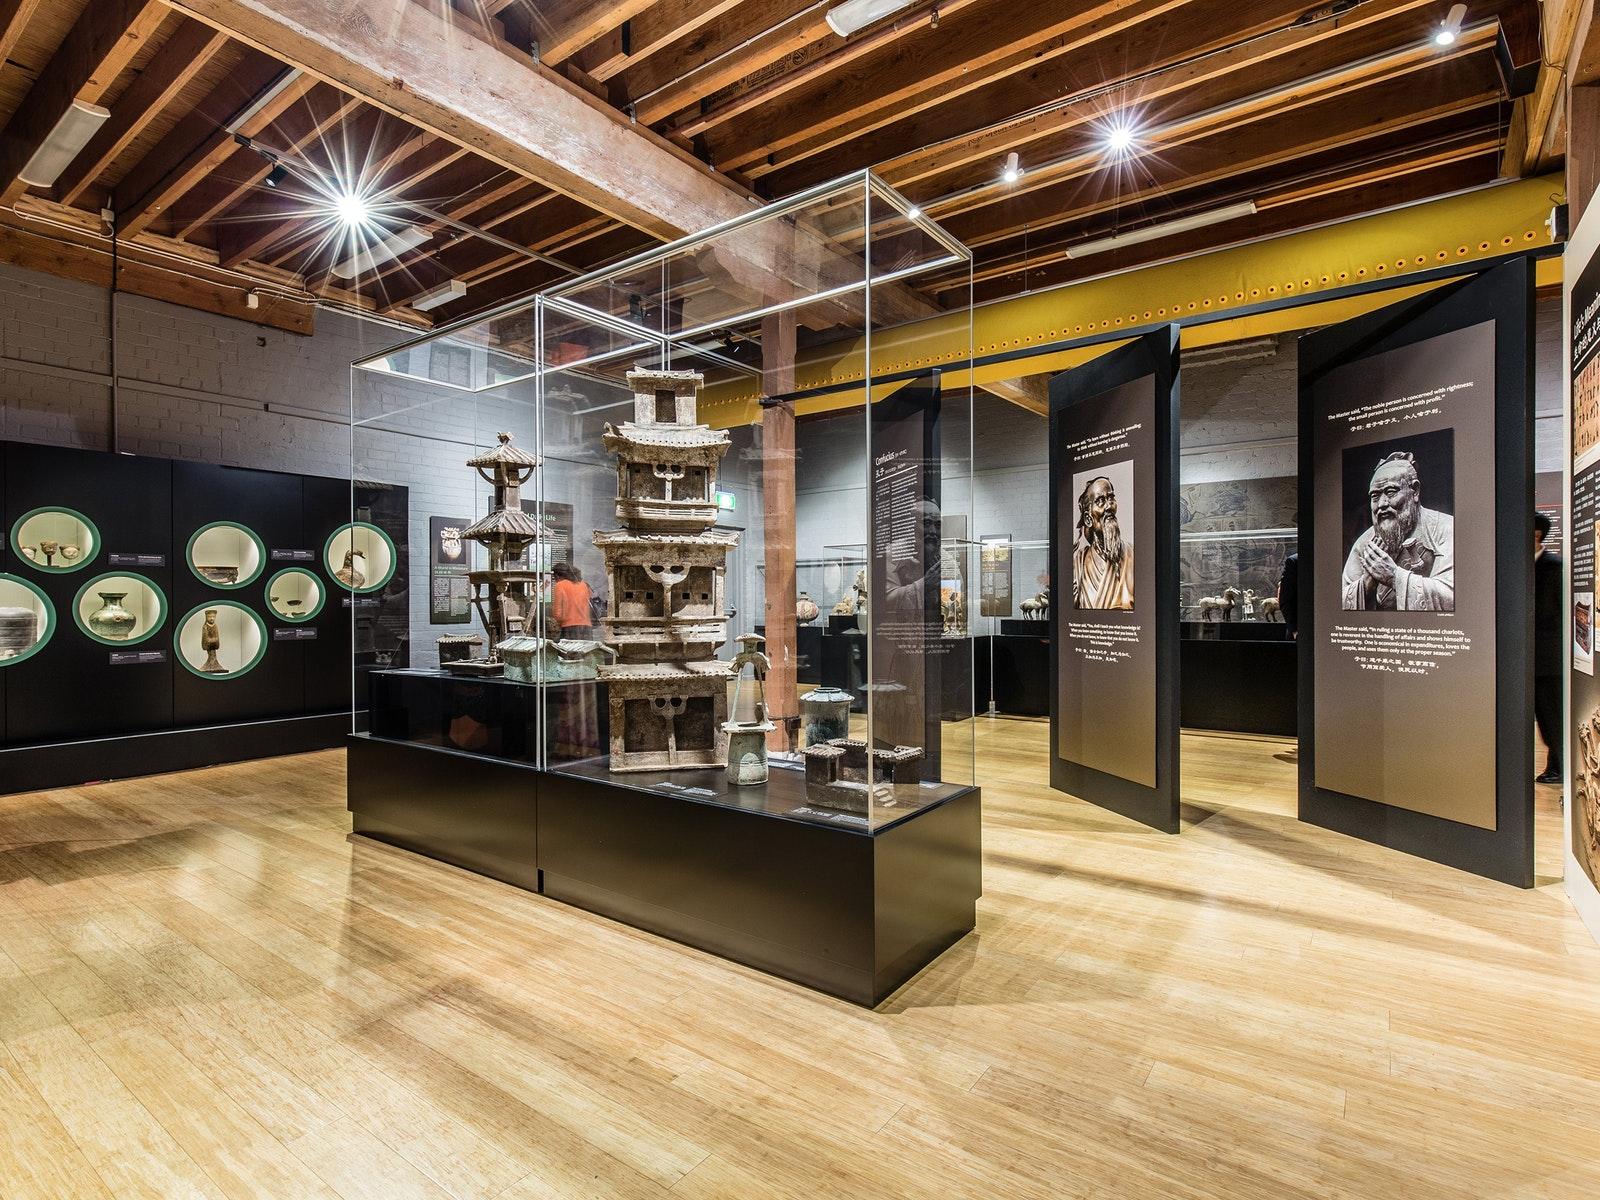 D Exhibition Melbourne : Art and exhibitions events victoria australia